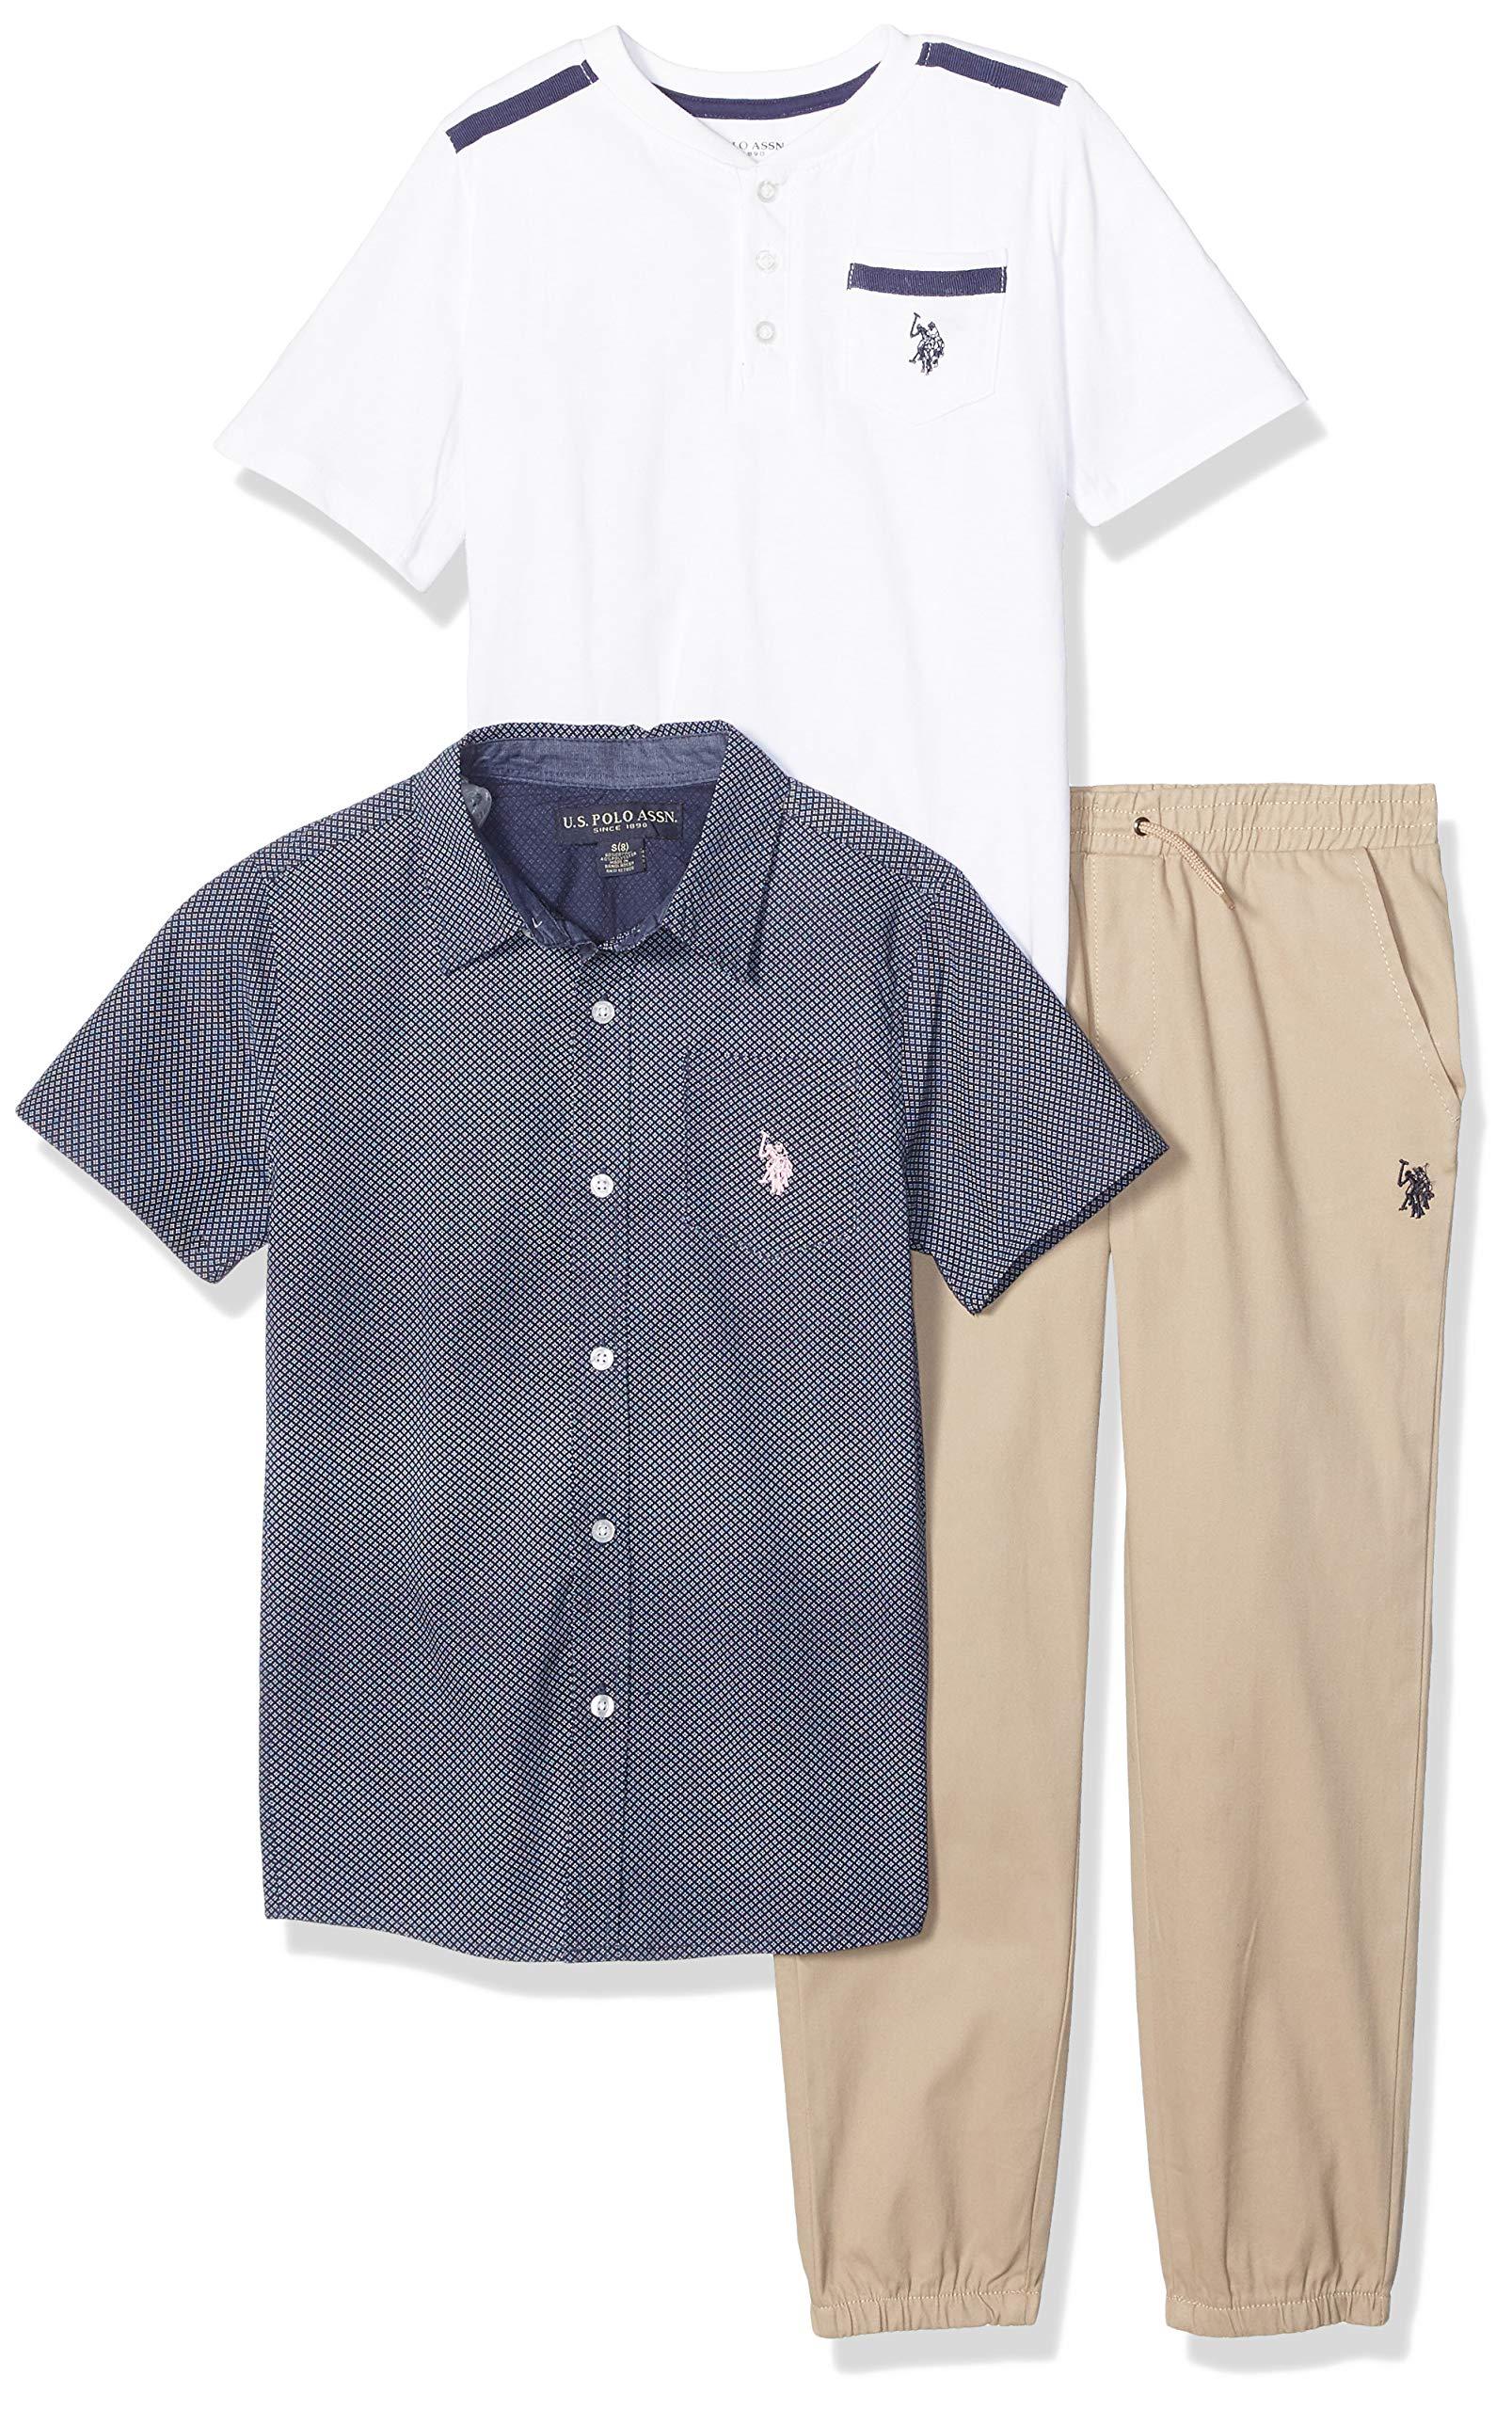 U.S. Polo Assn. Boys' Big 3 Piece Short Sleeve Woven, Henley T-Shirt, and Jogger Set, Light Pink Multi Plaid, 8